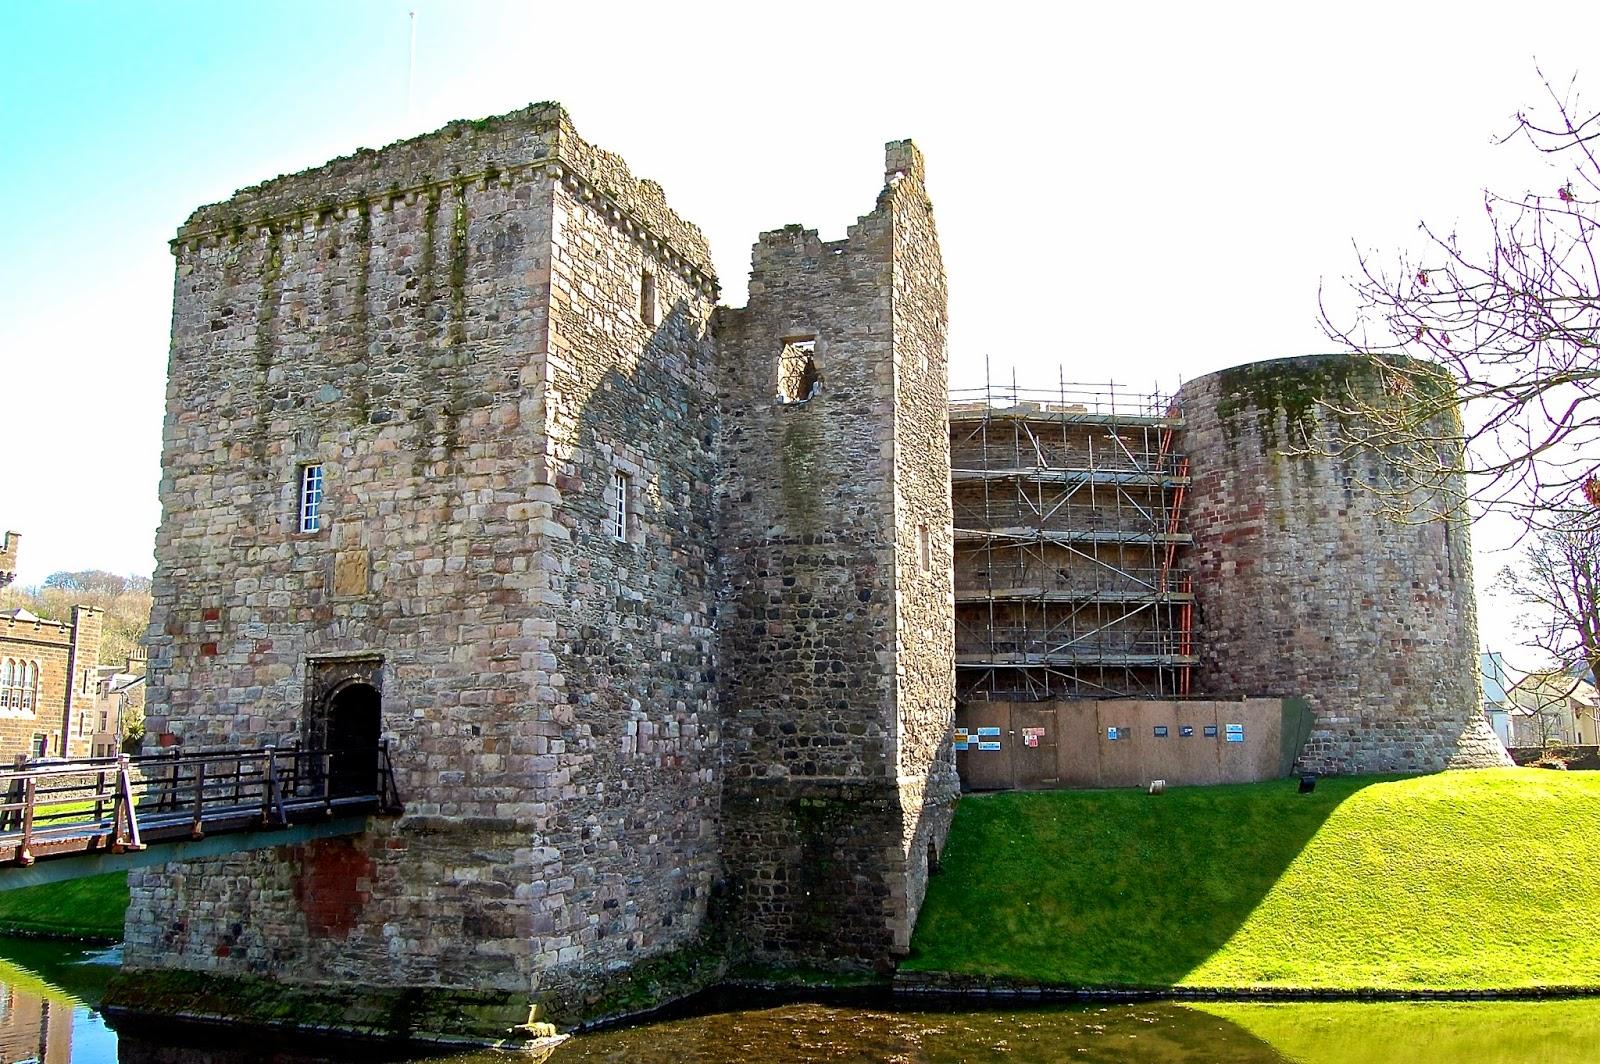 Rothesay Castle gatehouse, Isle of Bute